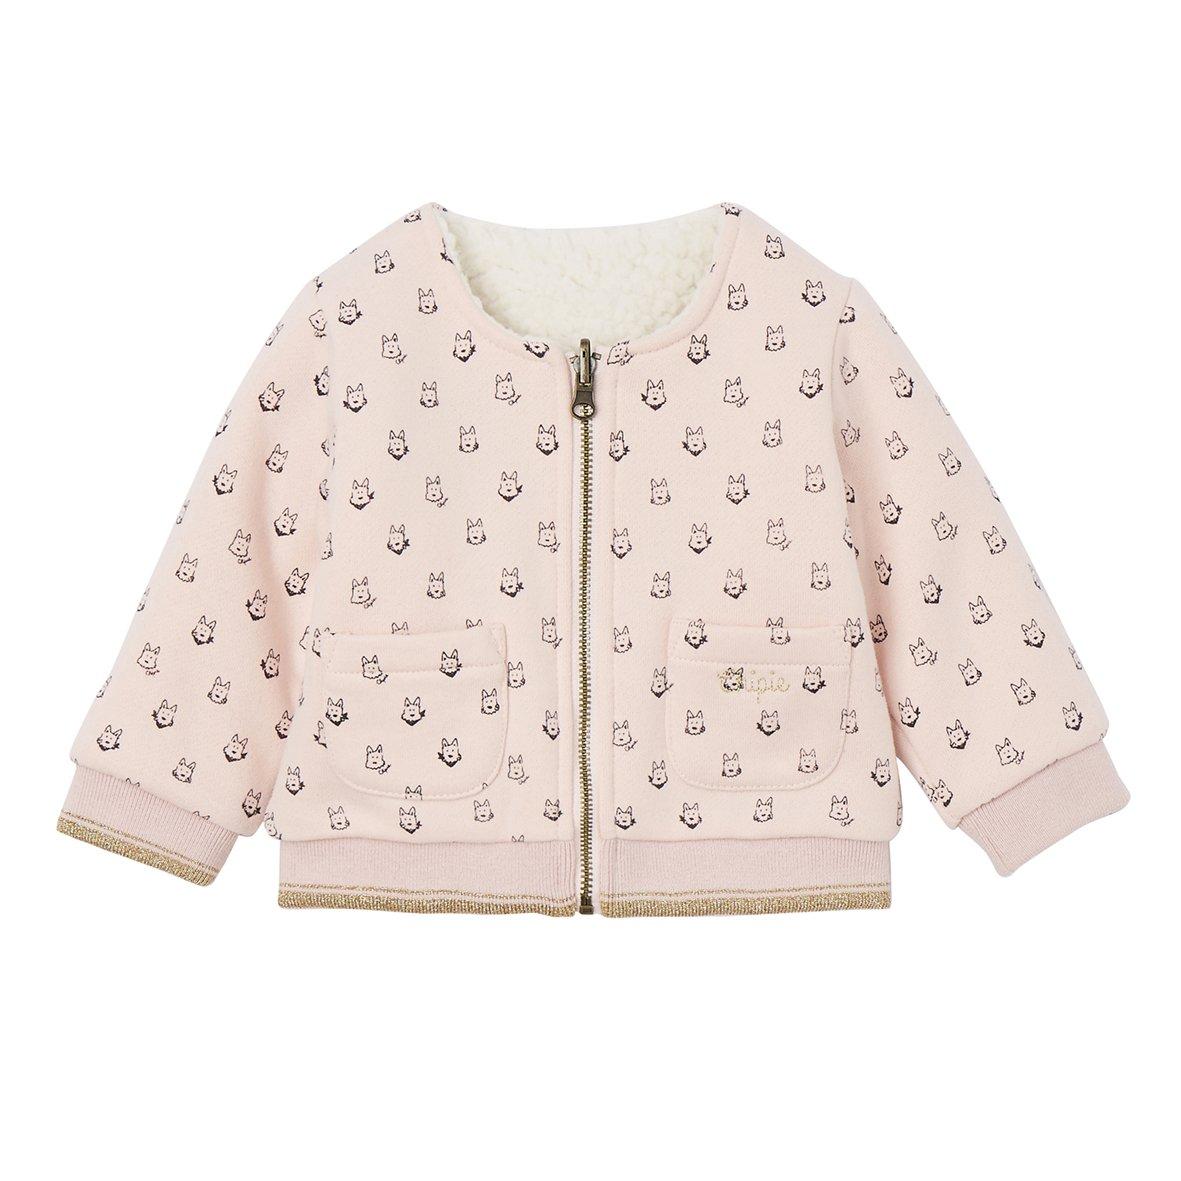 CHIPIE Baby Girls' Emir Sports Jacket Pink (Nacre 13) 2 Years (Sizes: 24M) 8K40010